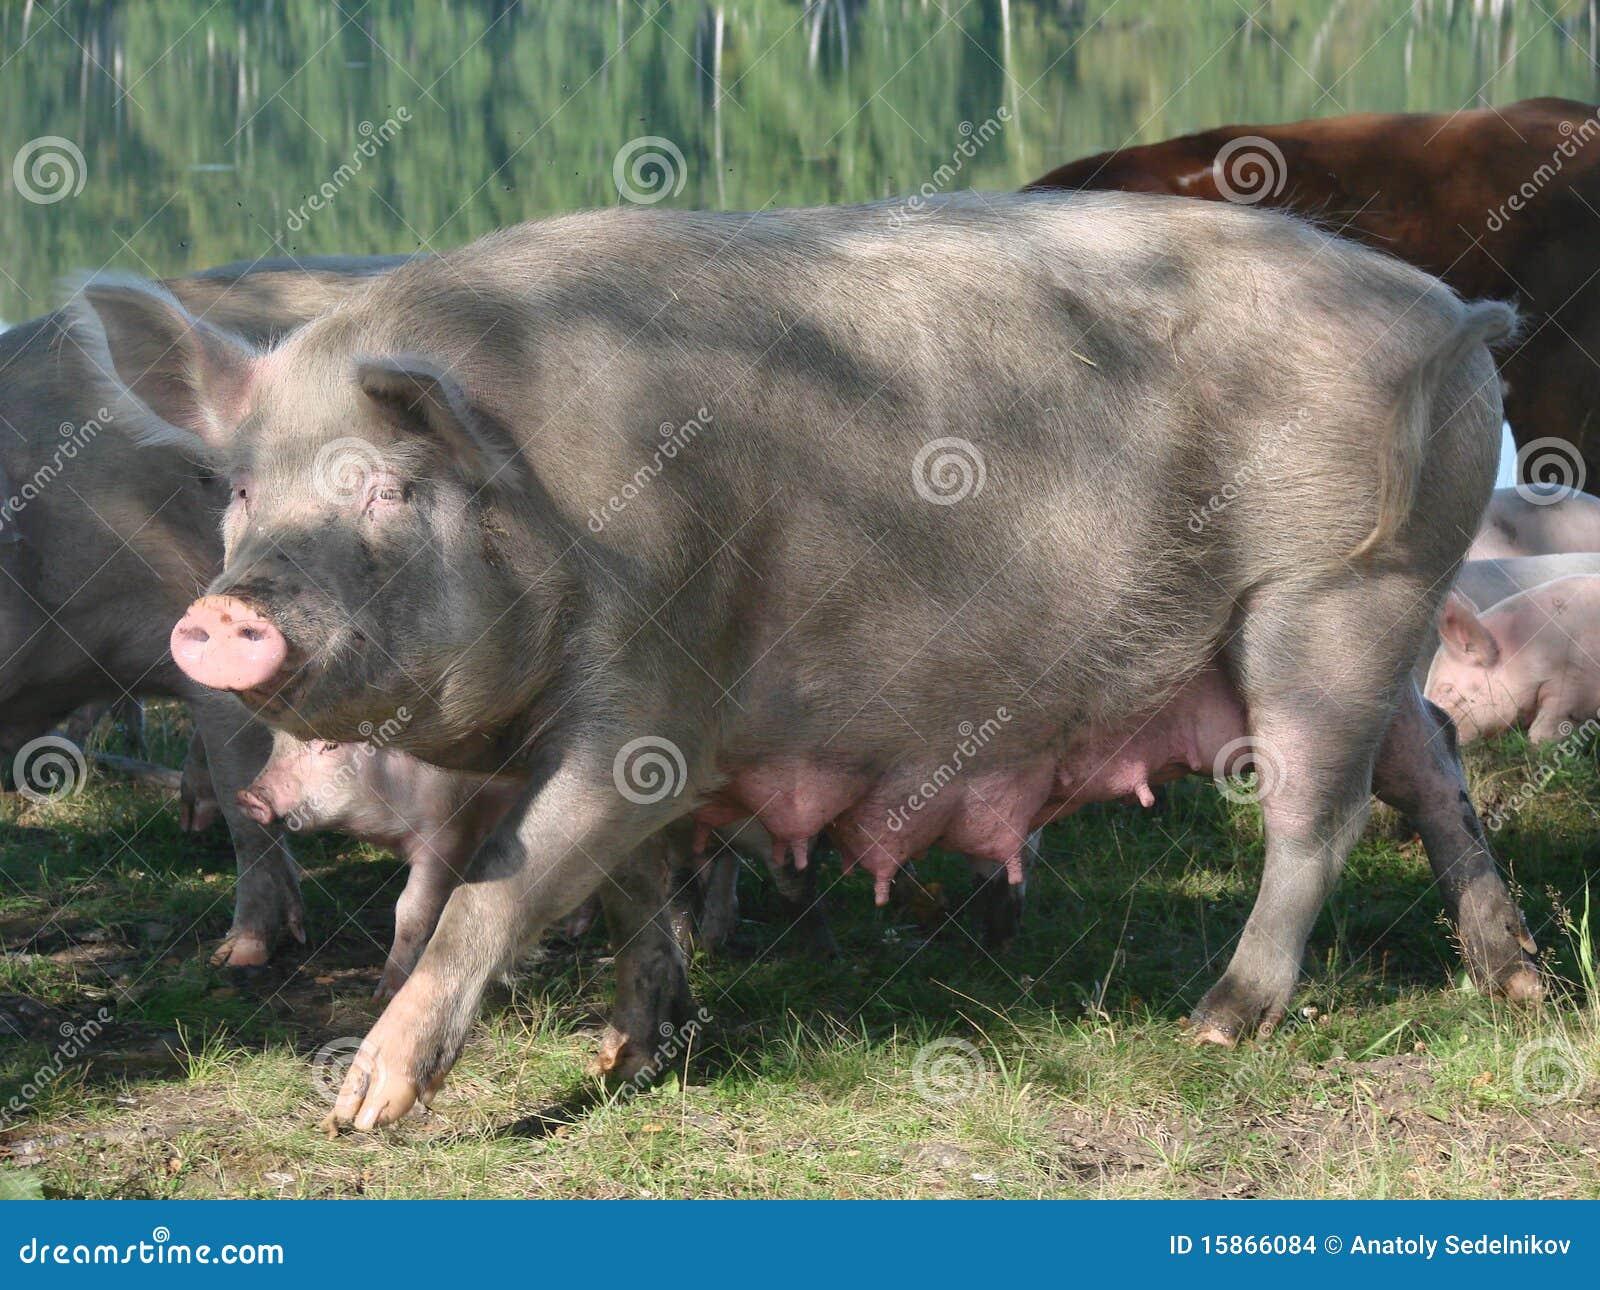 Female sow pig